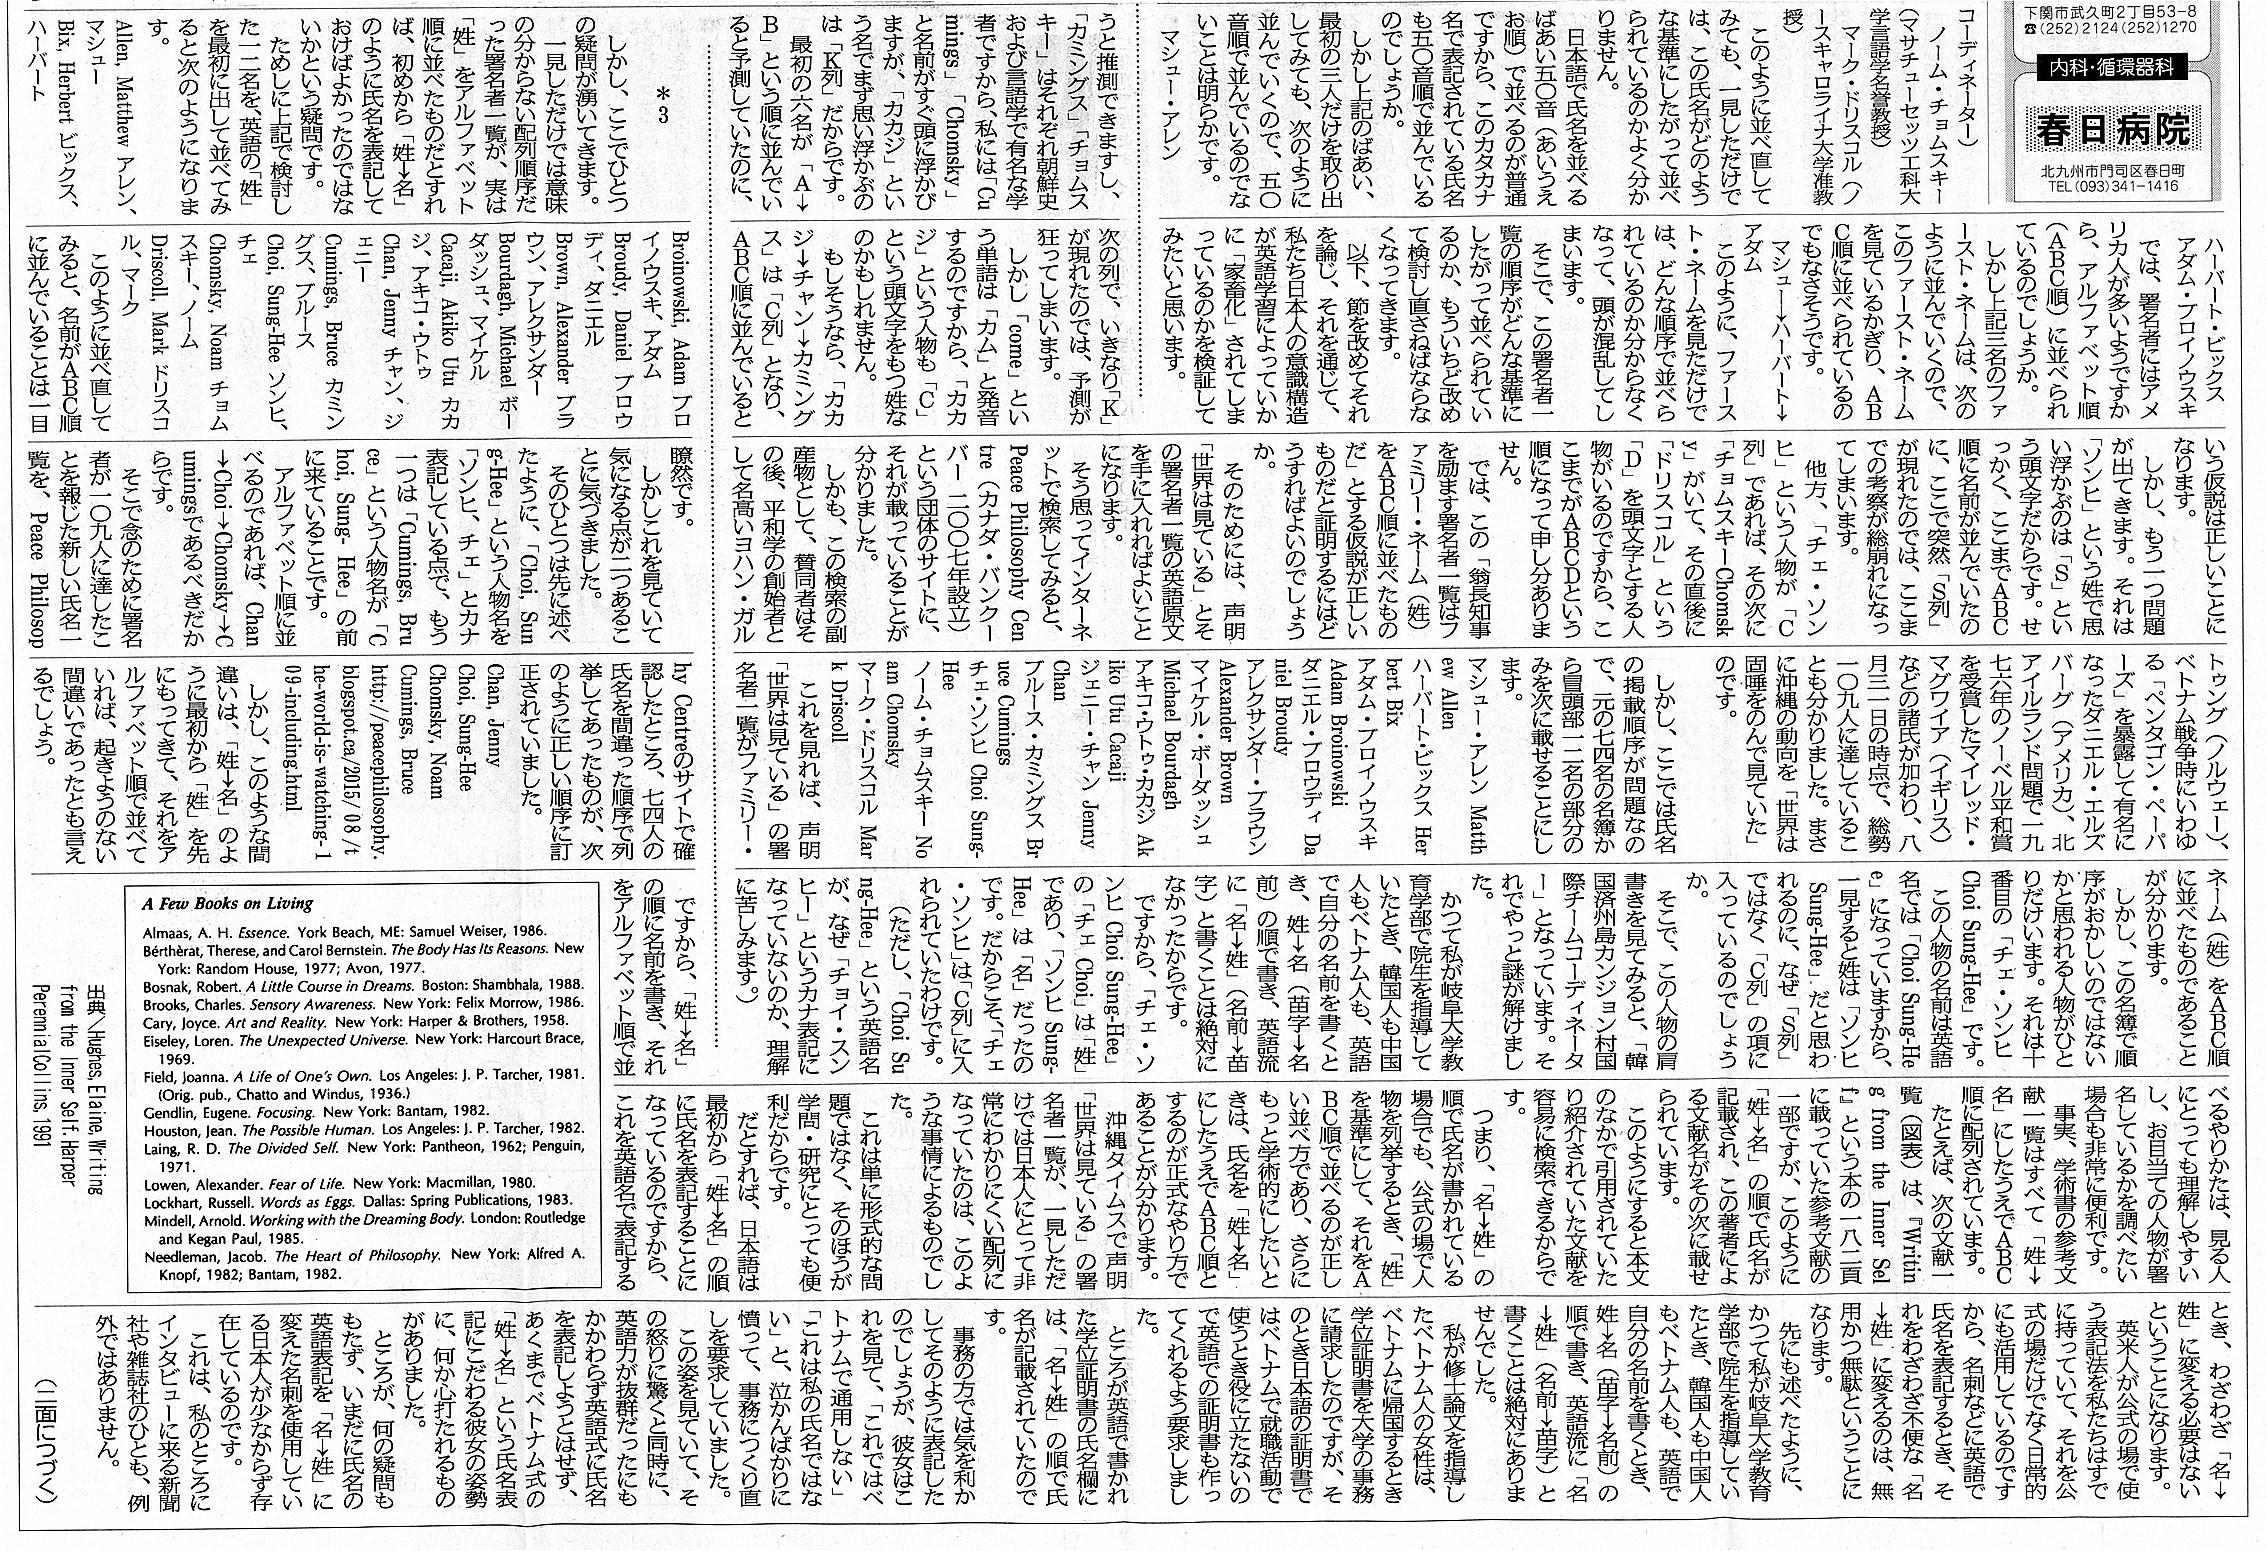 s-論文「軍事的従属と文化的従属」長周新聞20170106(2)